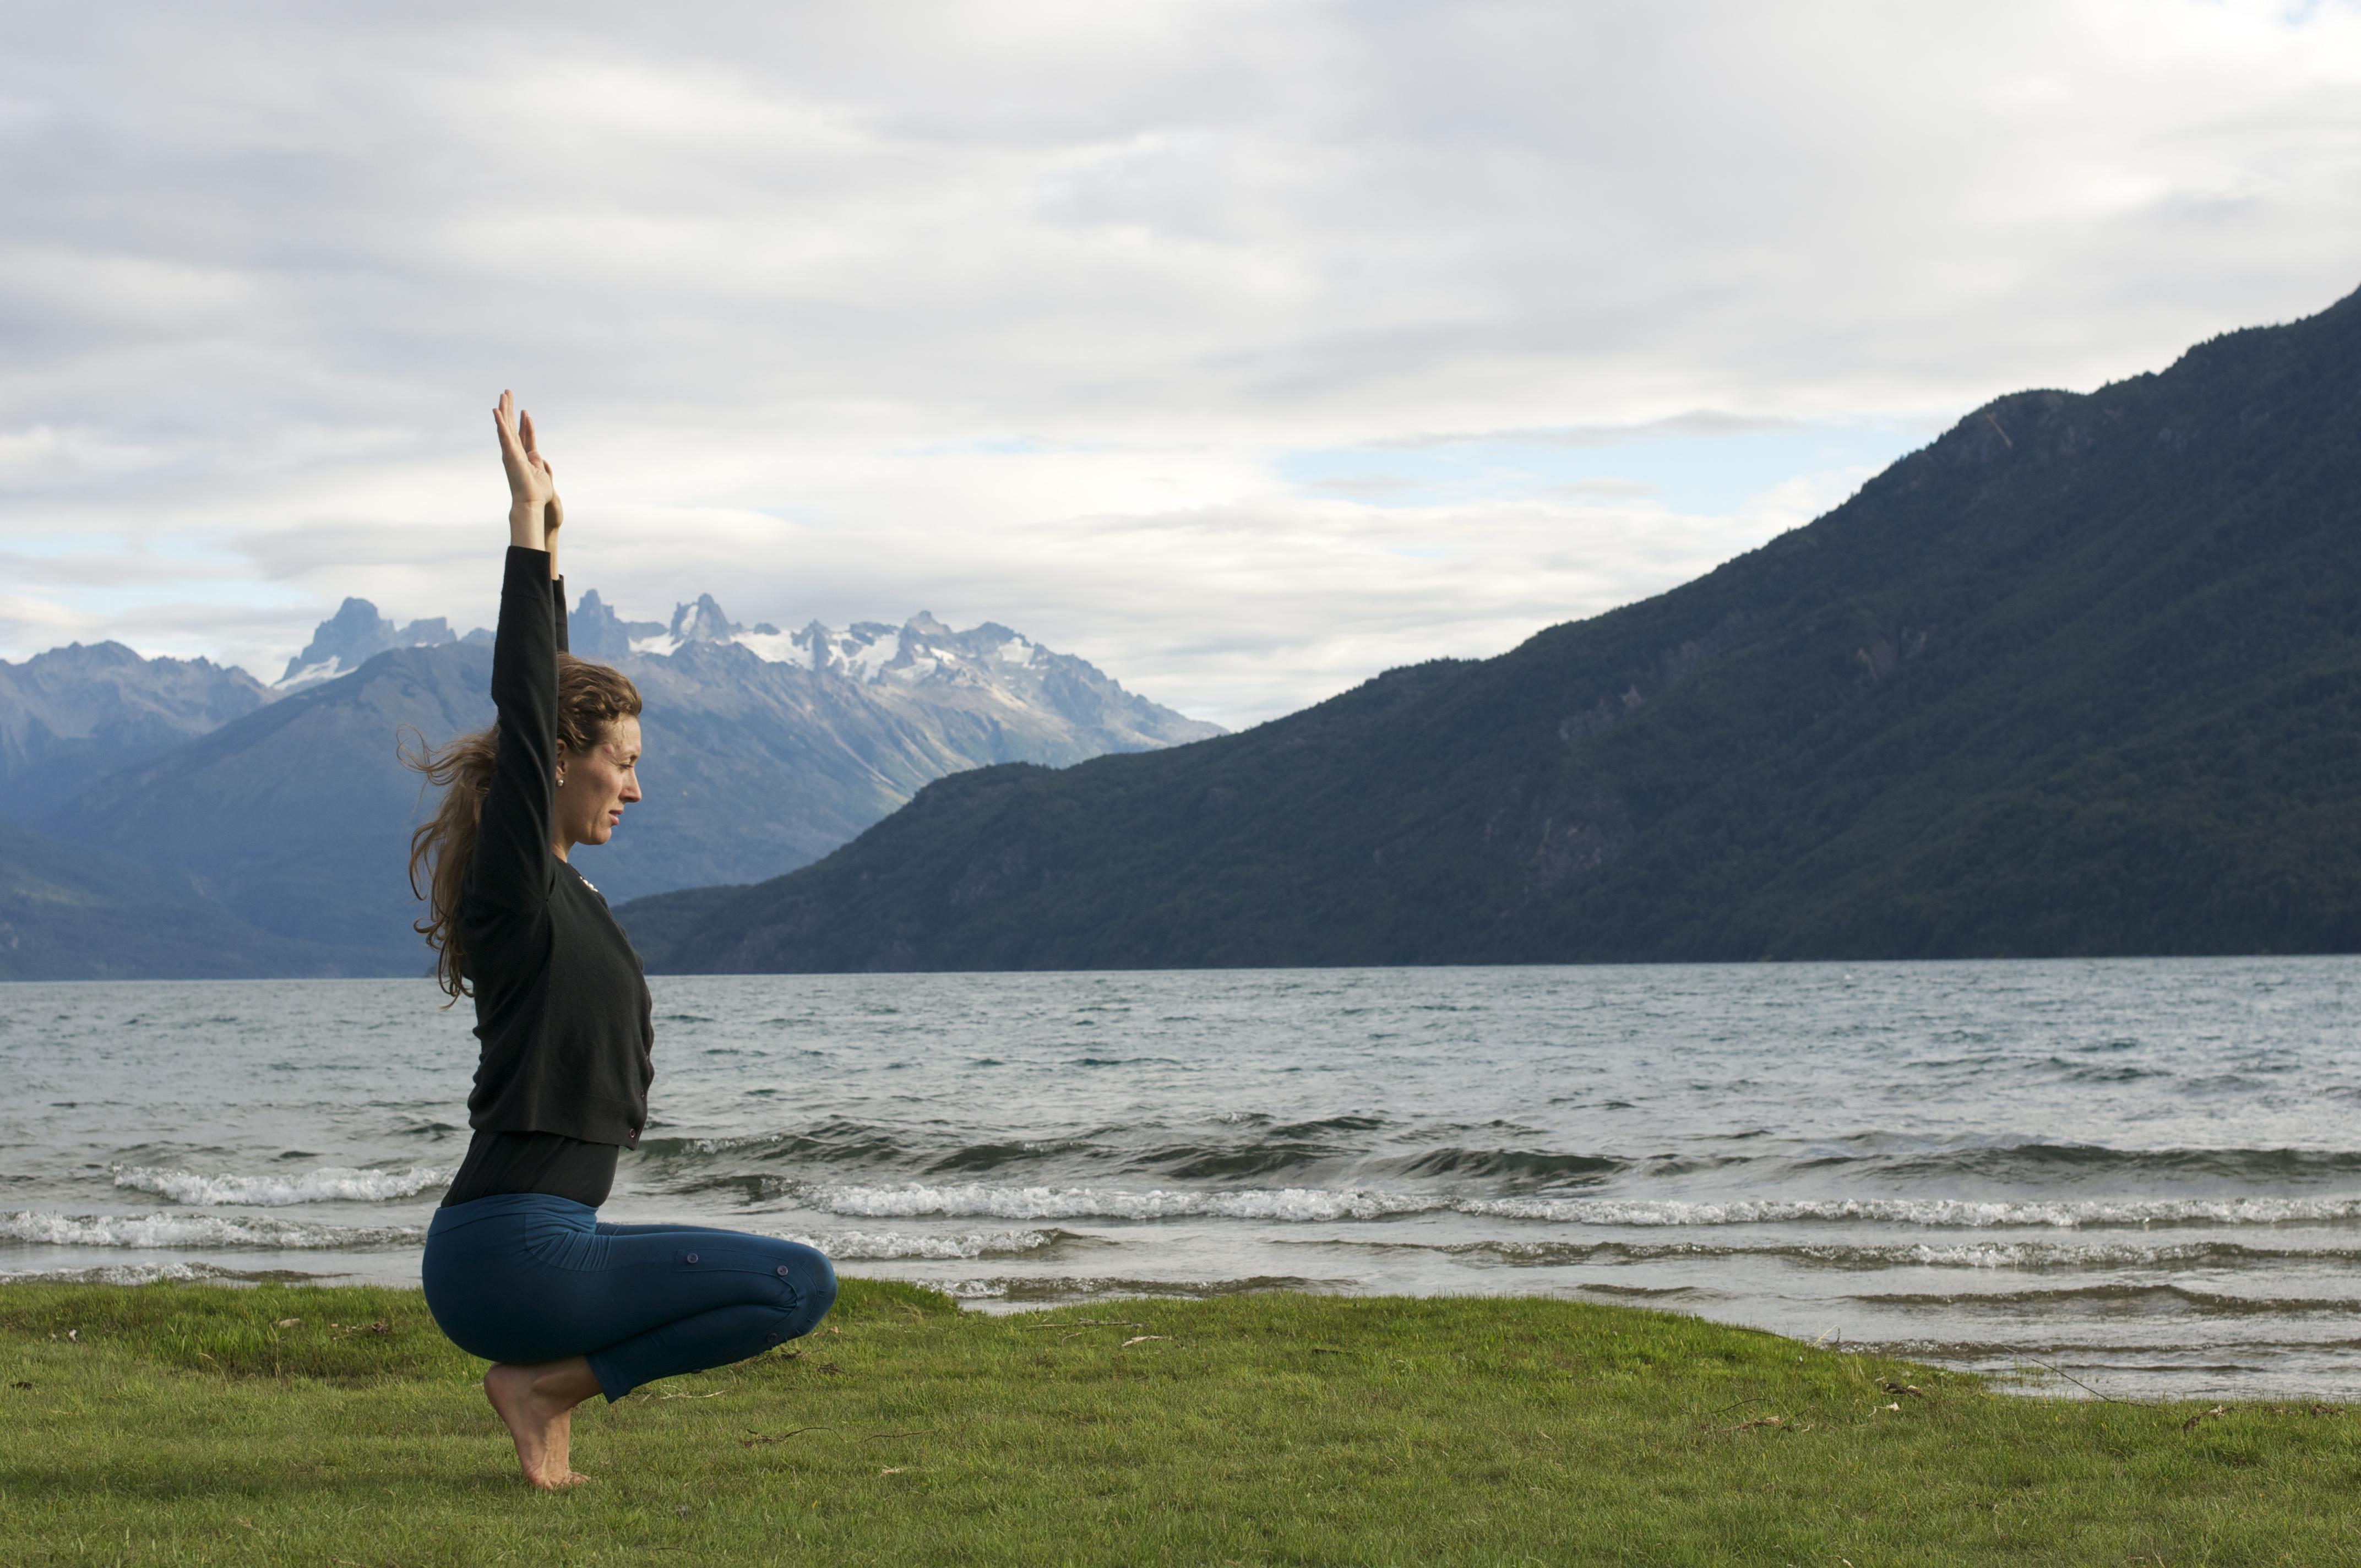 2012_03_13+Chloe++Yoga+Lago+Puelo+(126)+2.jpg